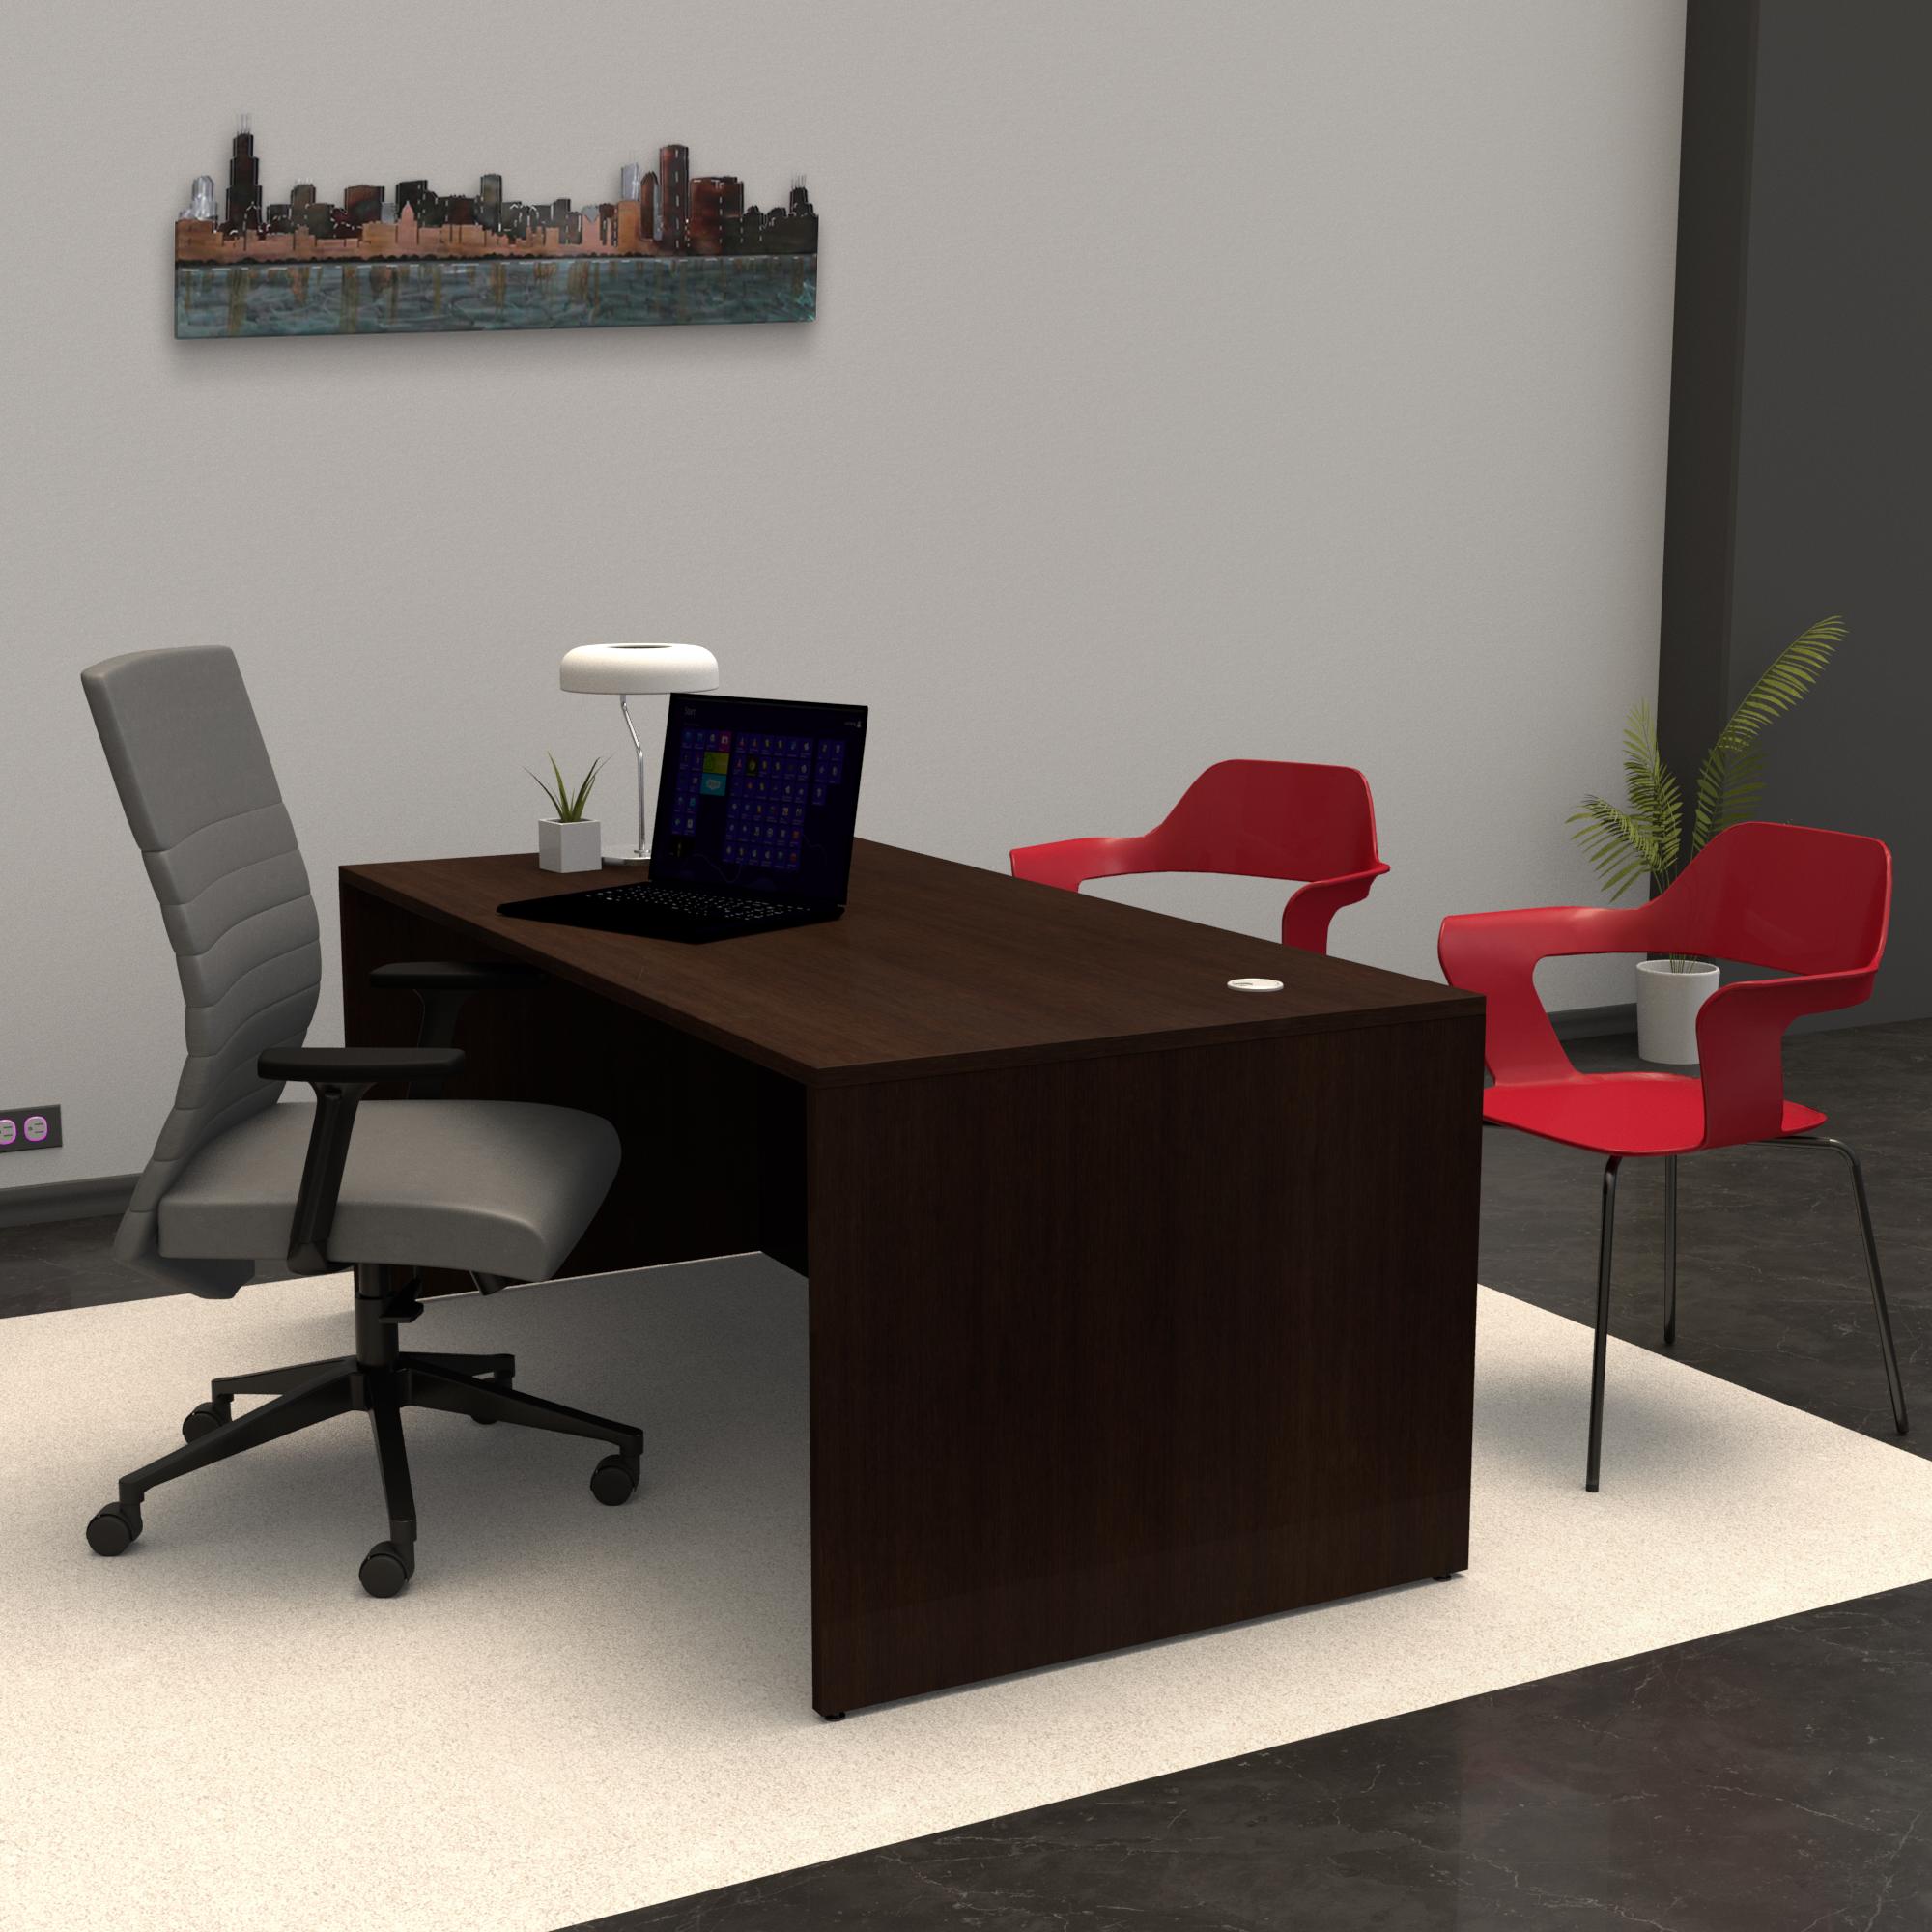 Pivit Full Panel Desk (Cafe) | MaximLT Task Seating (Anchor) | Bardot Guest Chair (Siren)